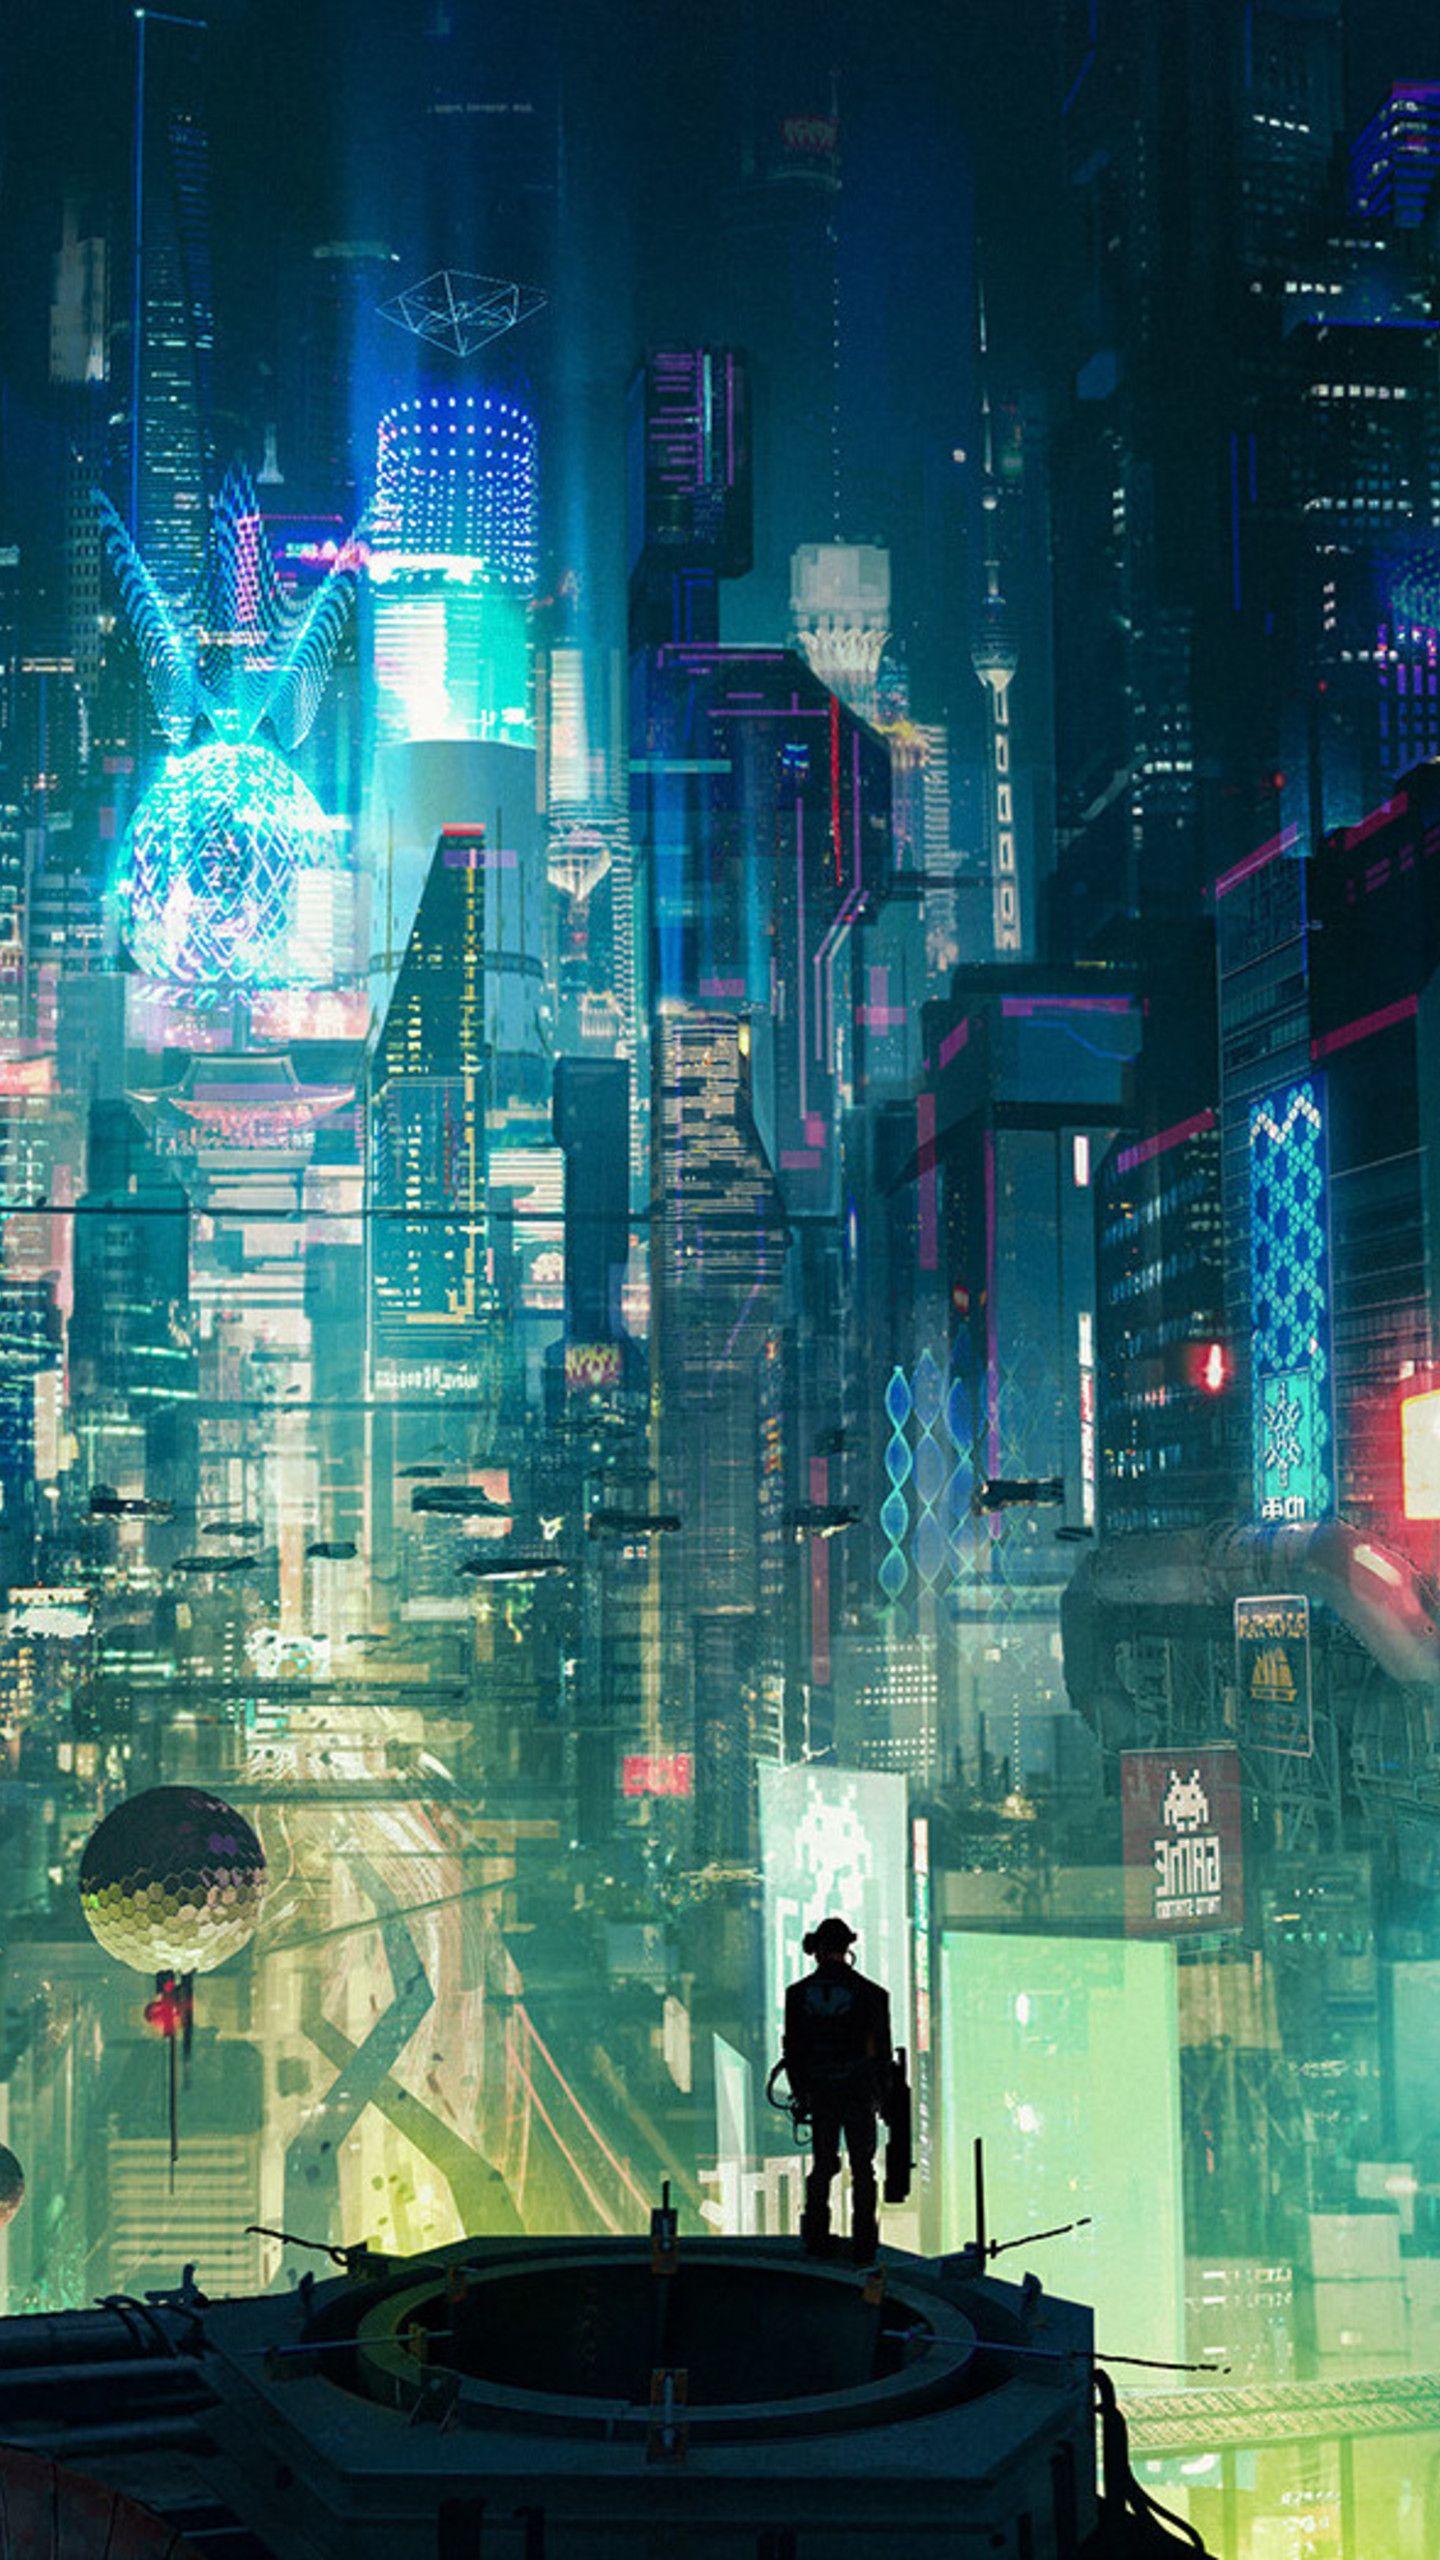 cyberpunkcityrt1440x2560.jpg 1,440×2,560 pixels 街並み